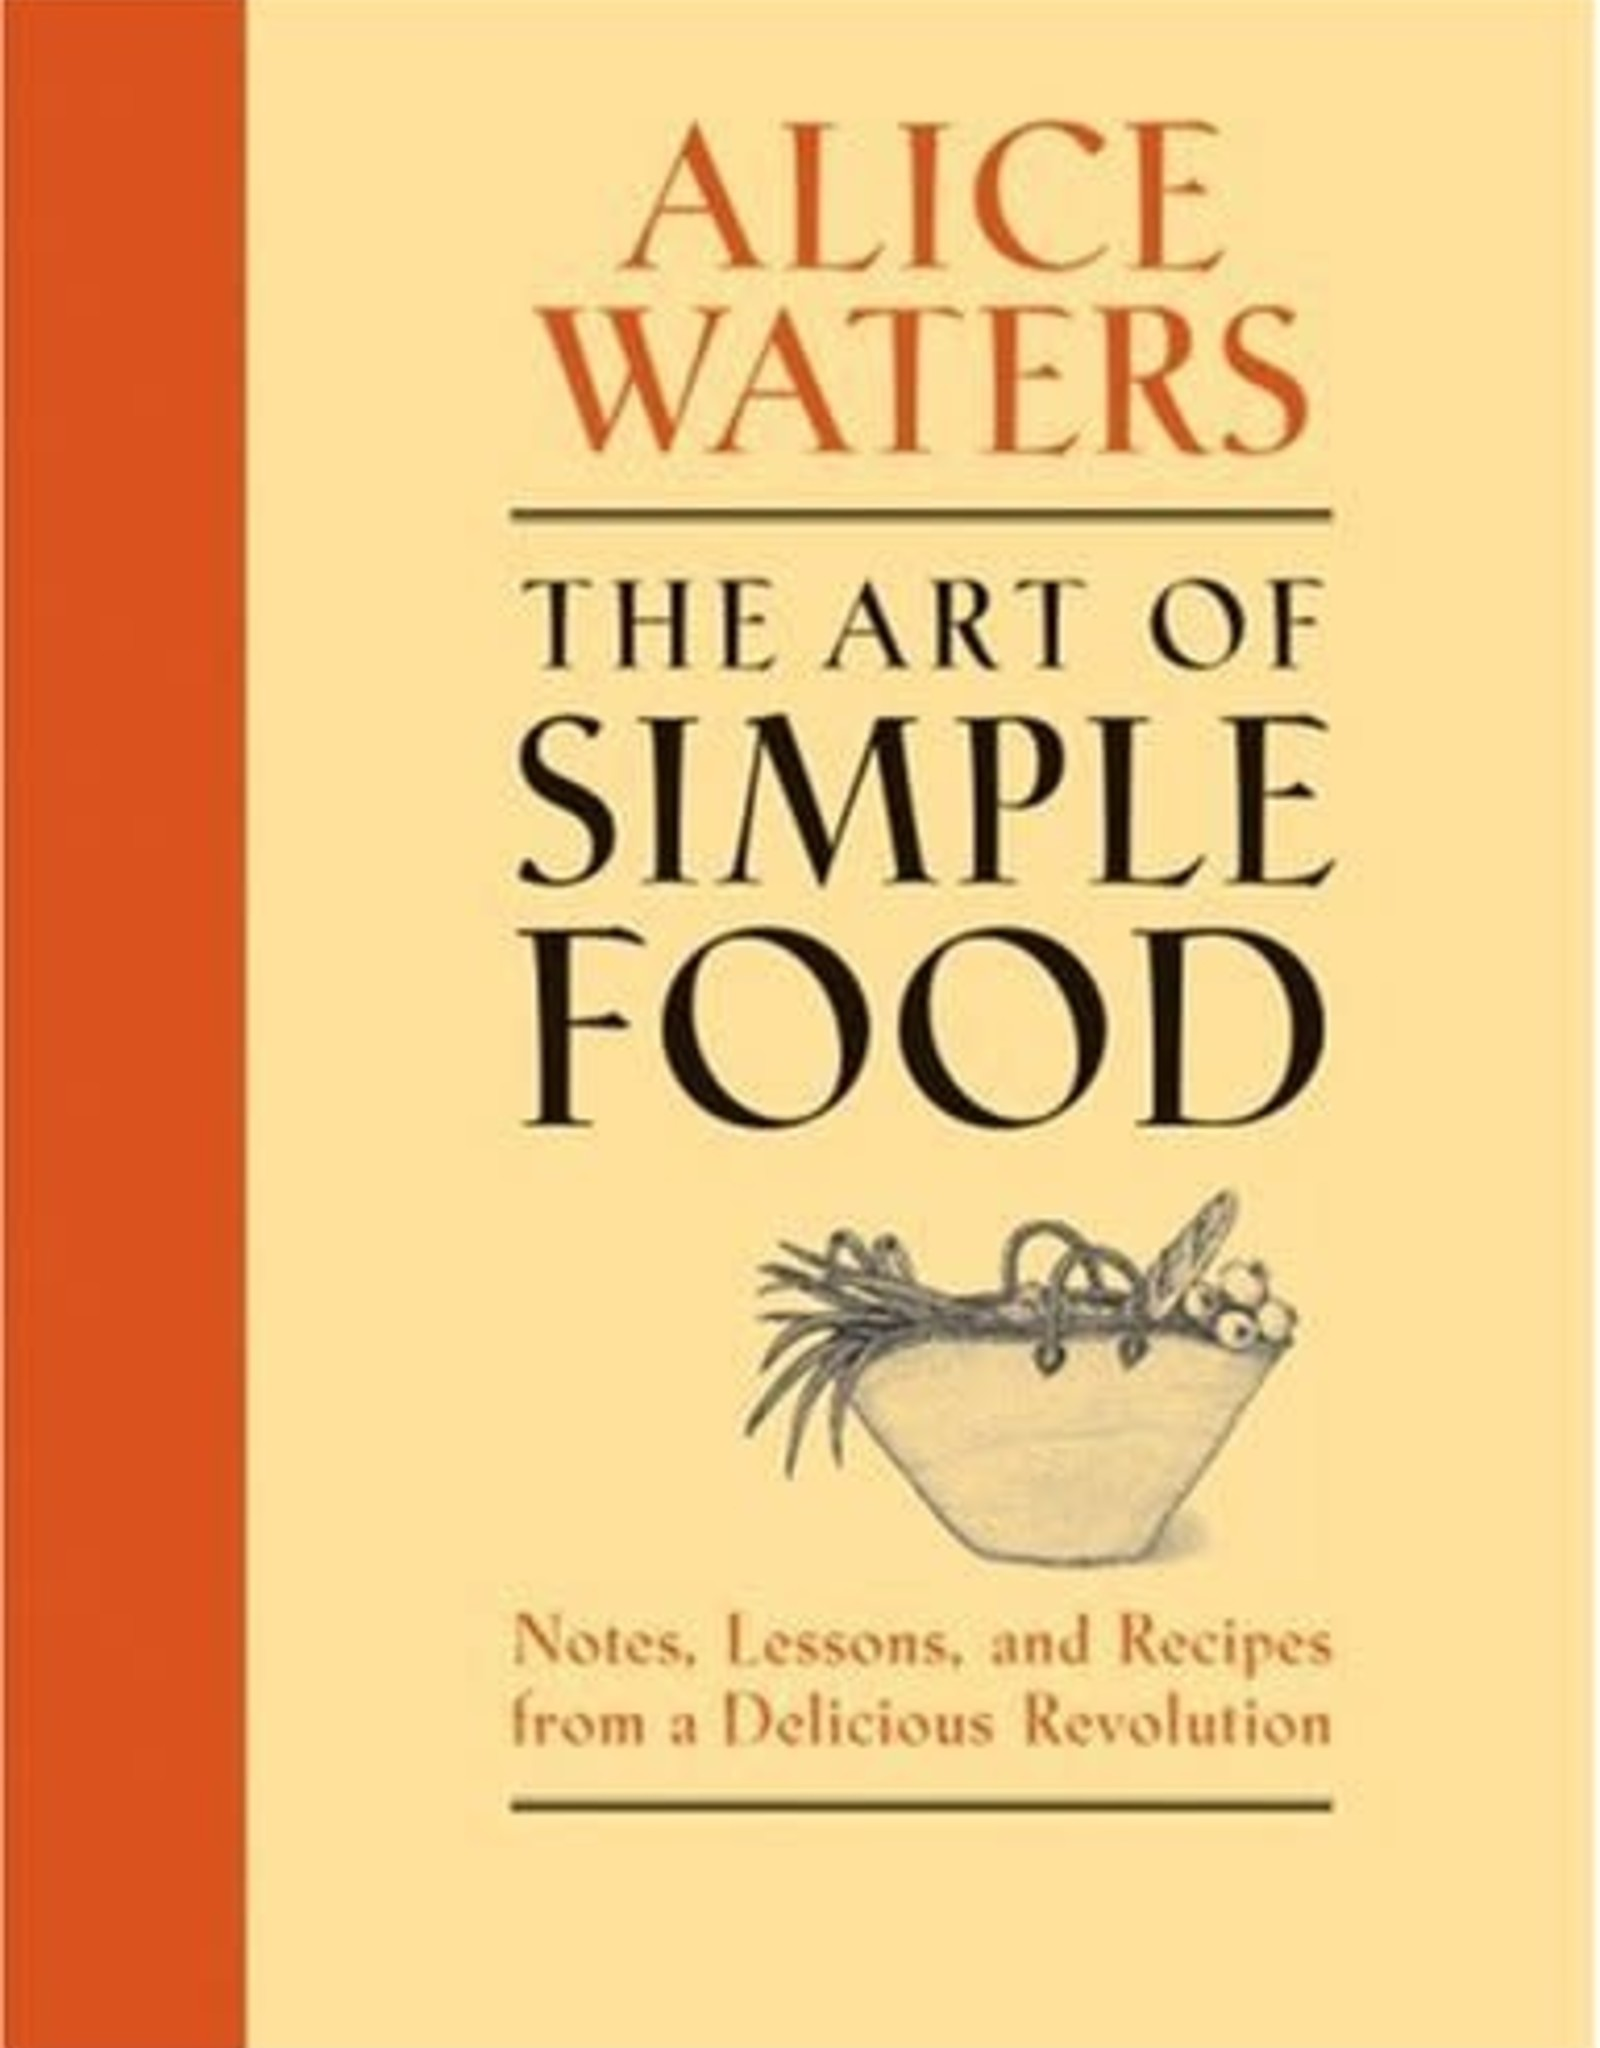 The Art of simple food, Alice Waters